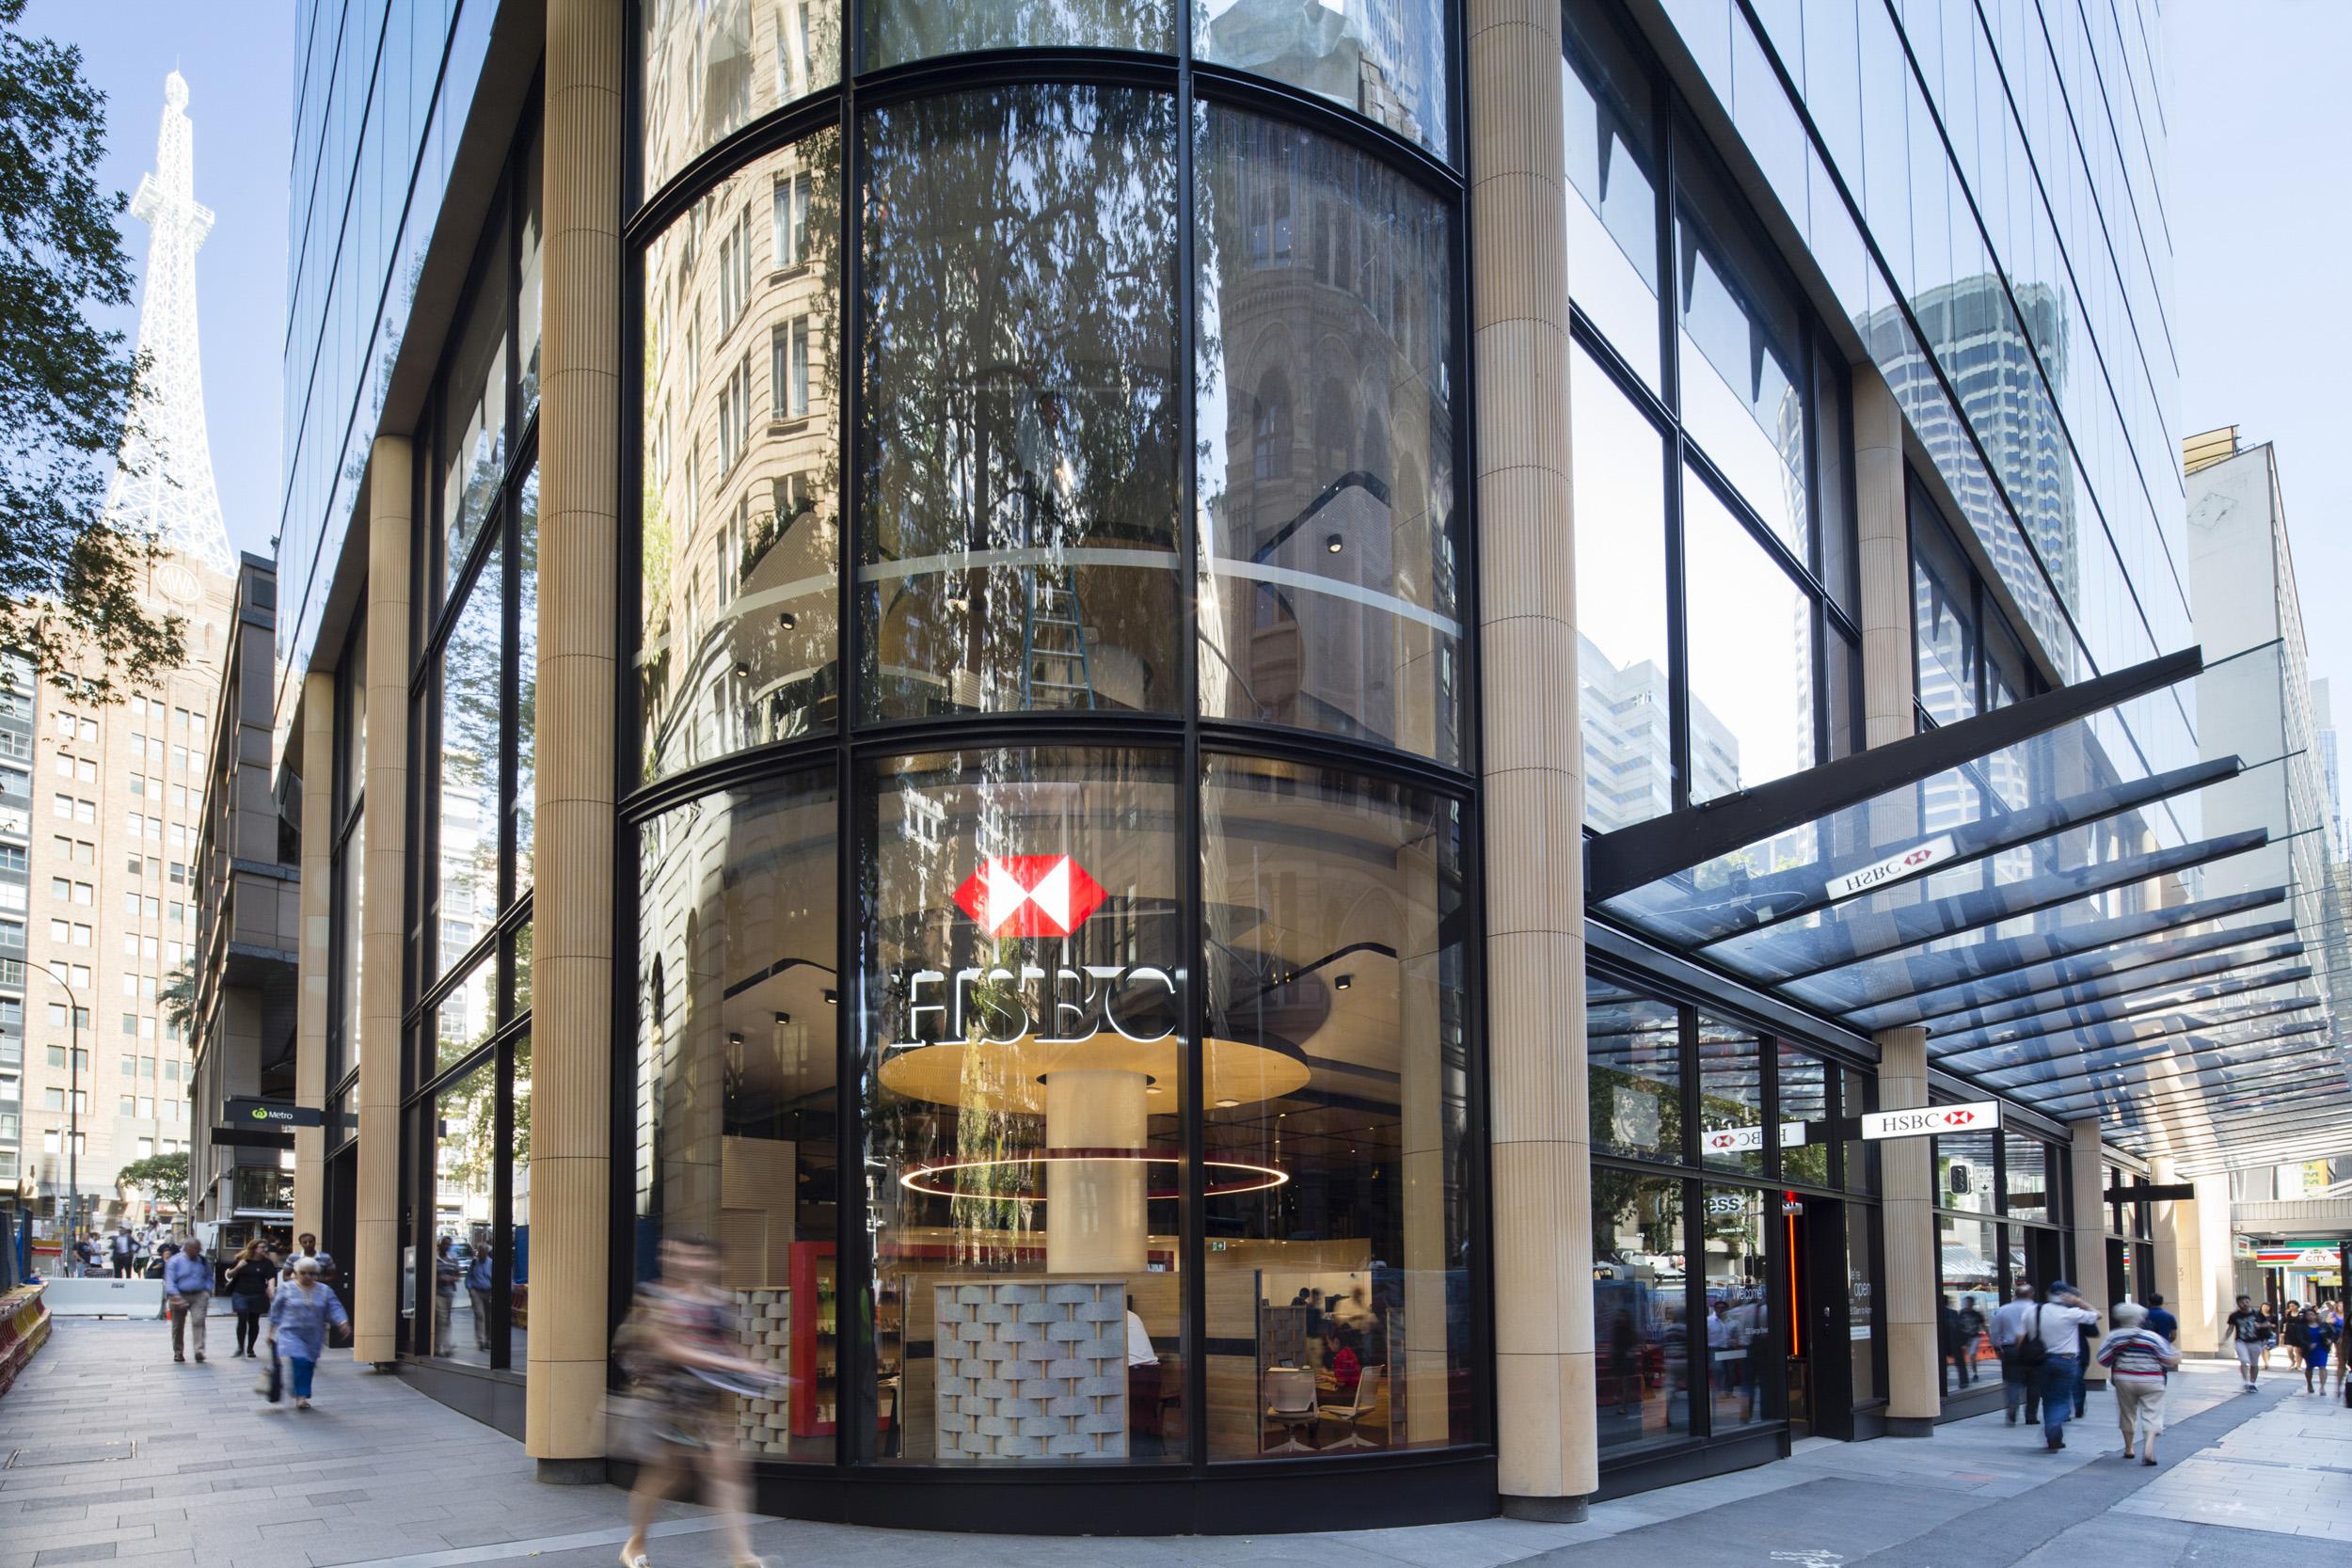 hirise_architecture_sydney_australia_24.jpg